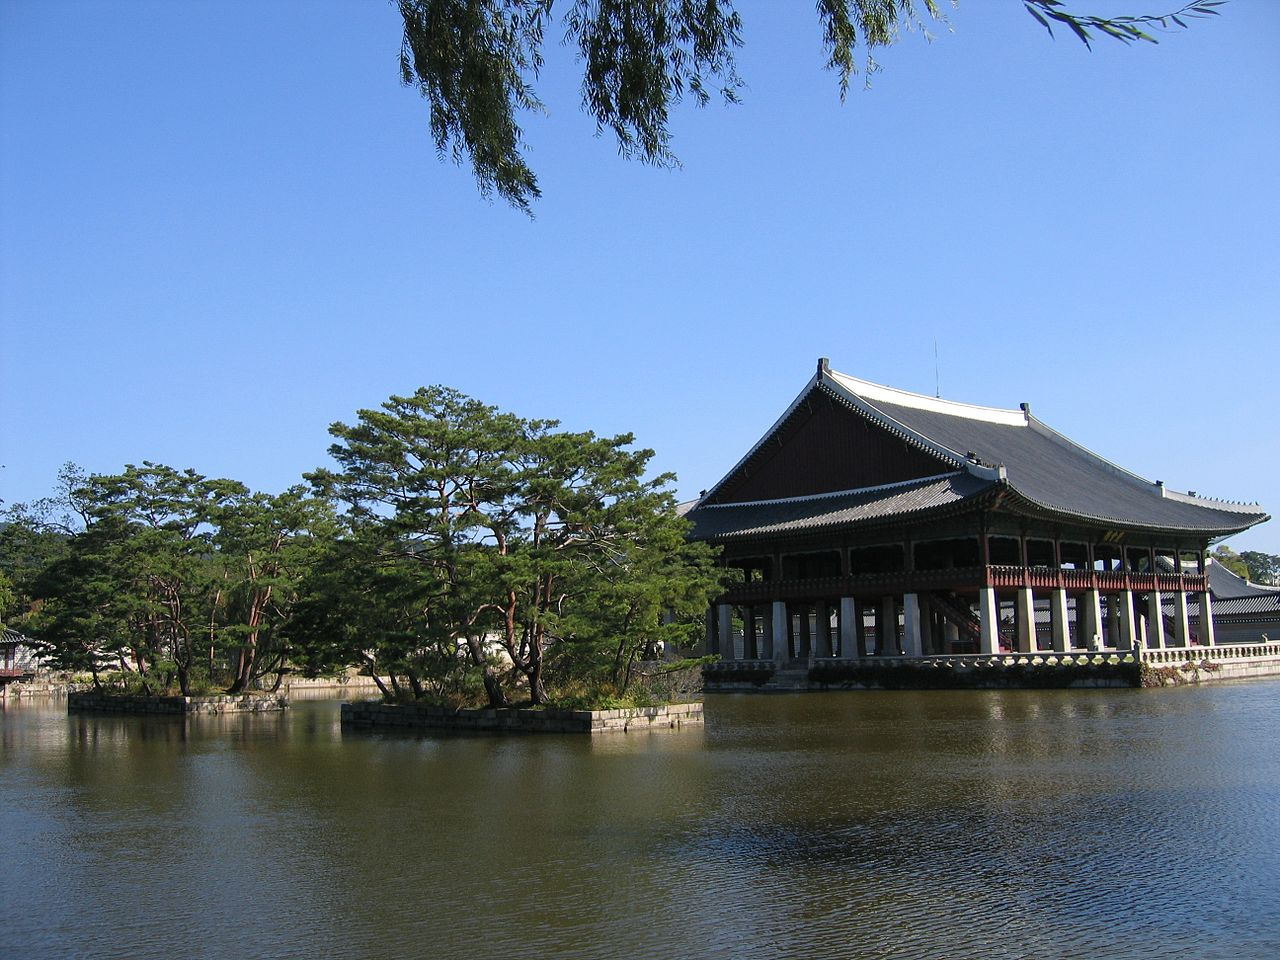 Дворец Кёнбоккун, павильон Кёнхверу